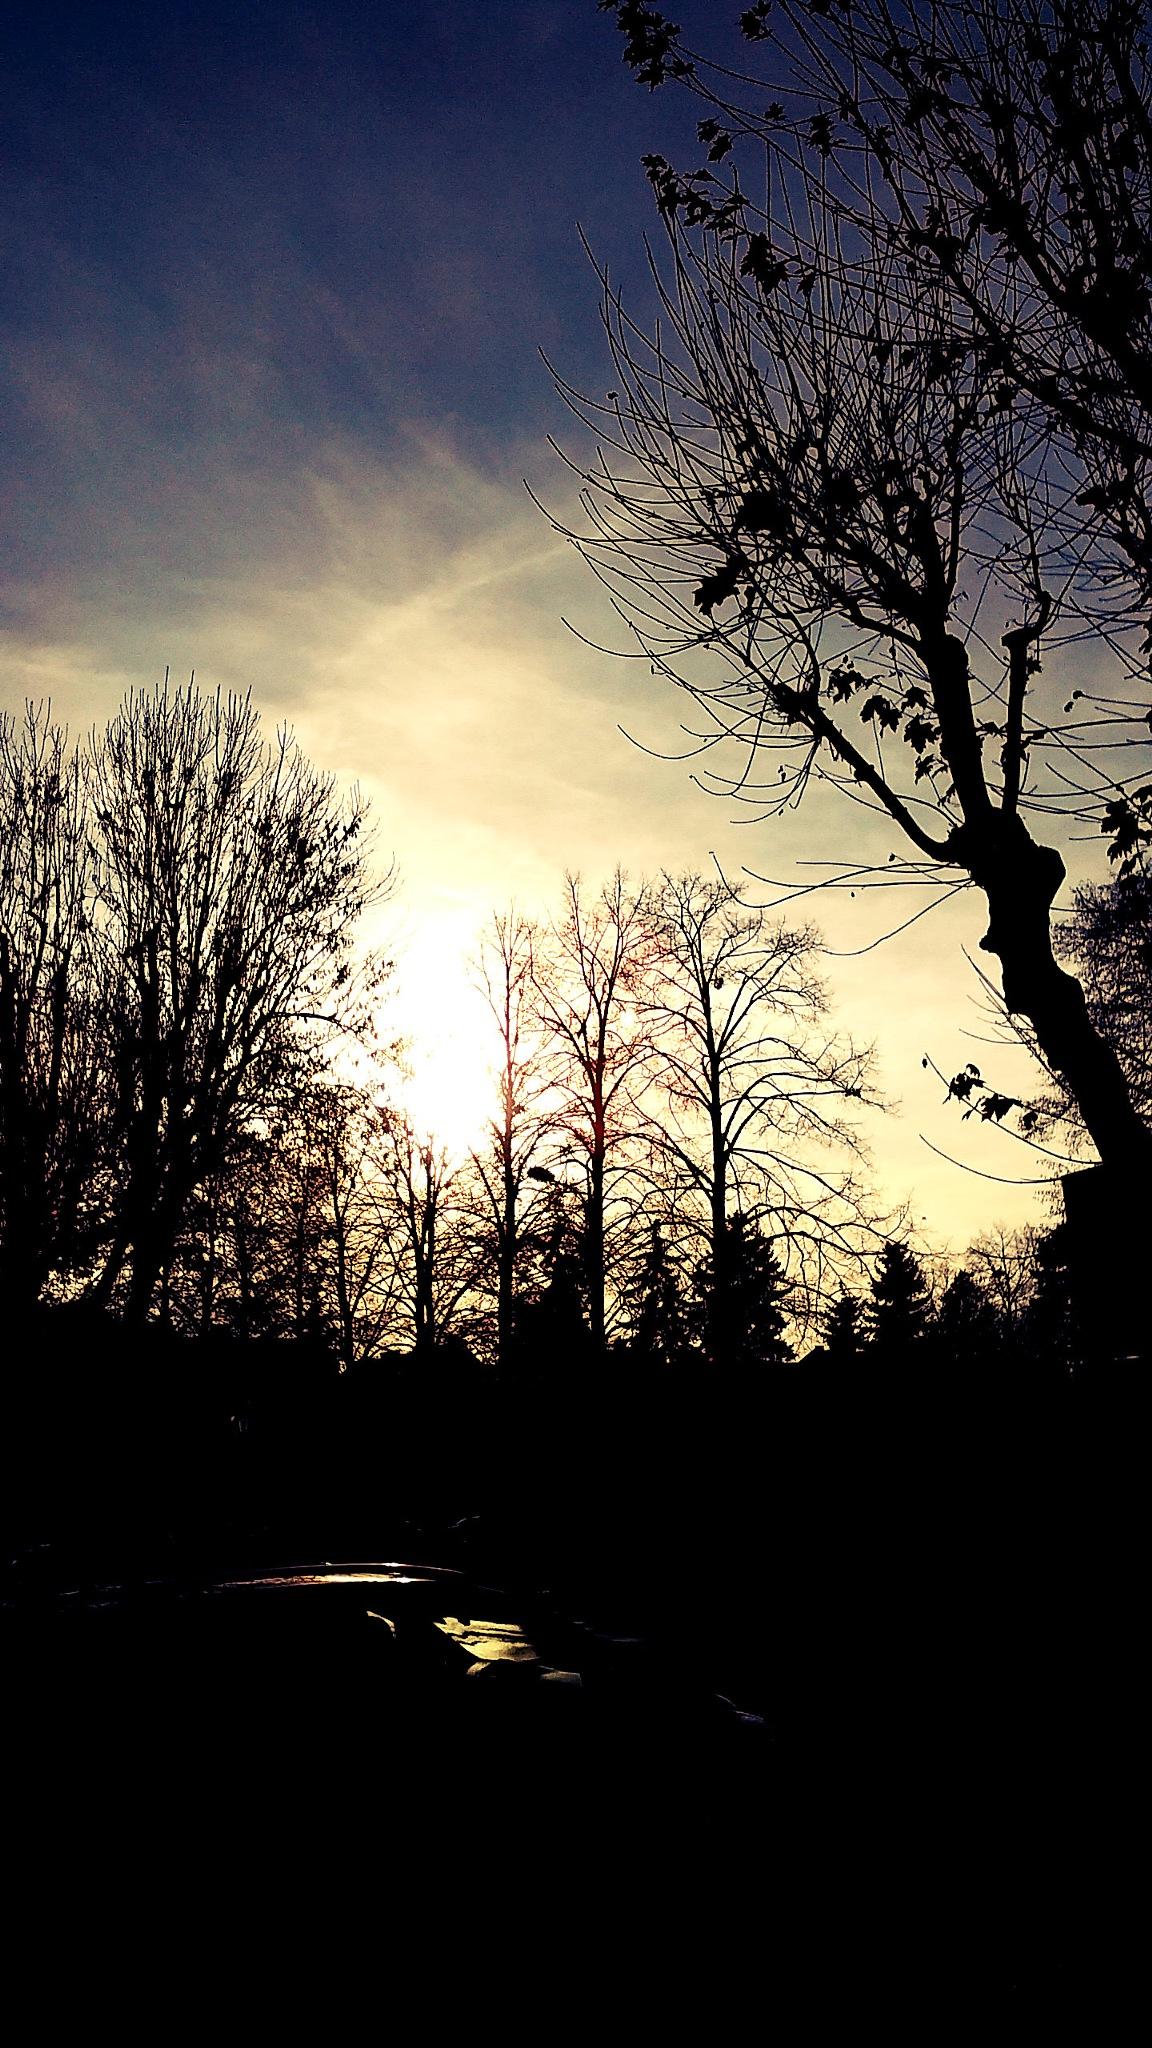 Forest by ogiegloart